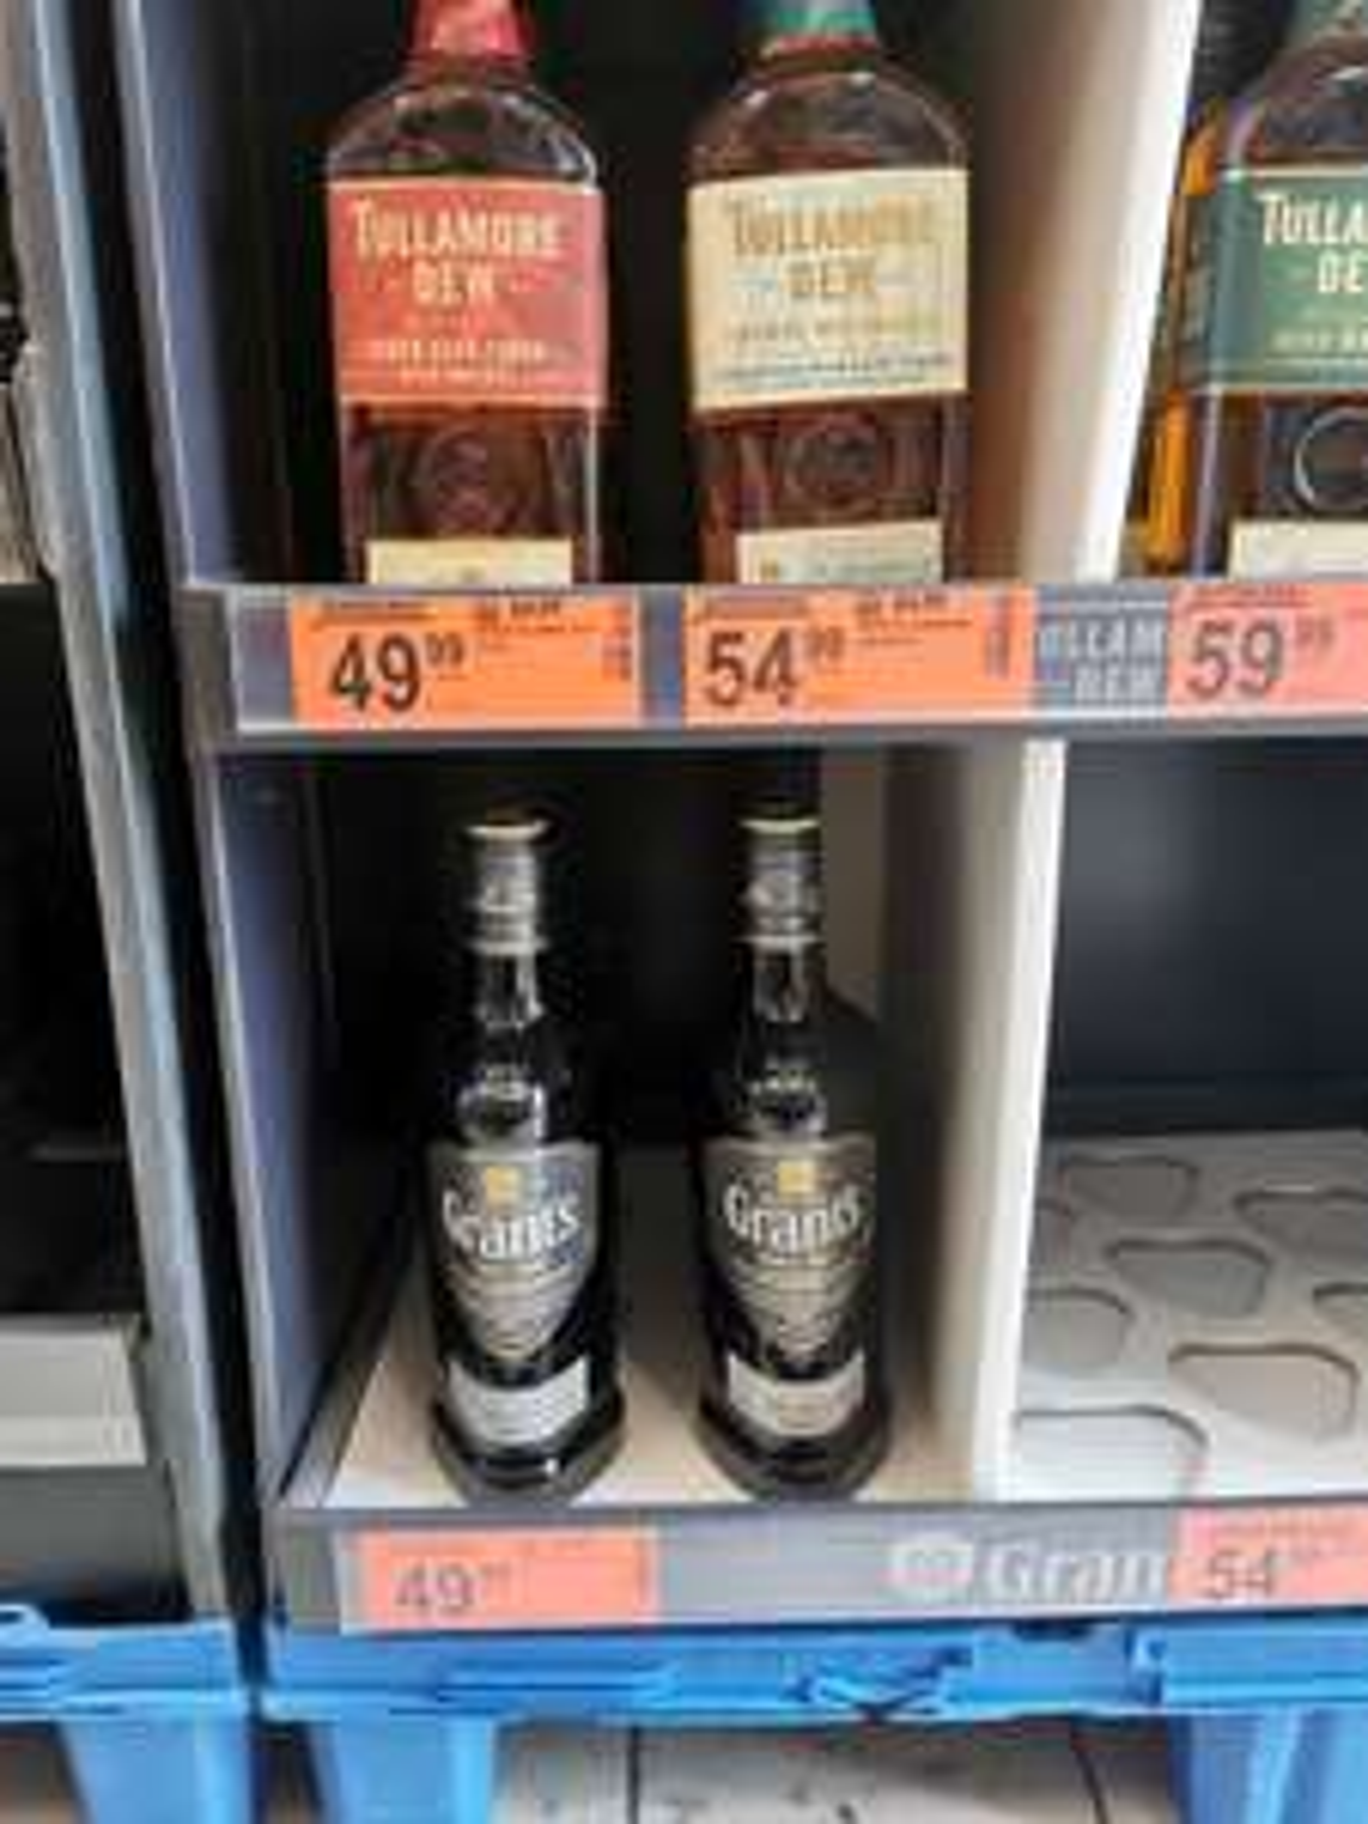 Biedronka : Tullamore Dew Cider & Caribbean Rum Cask Finish 0,7l oraz Grant's Smoky 0,7l